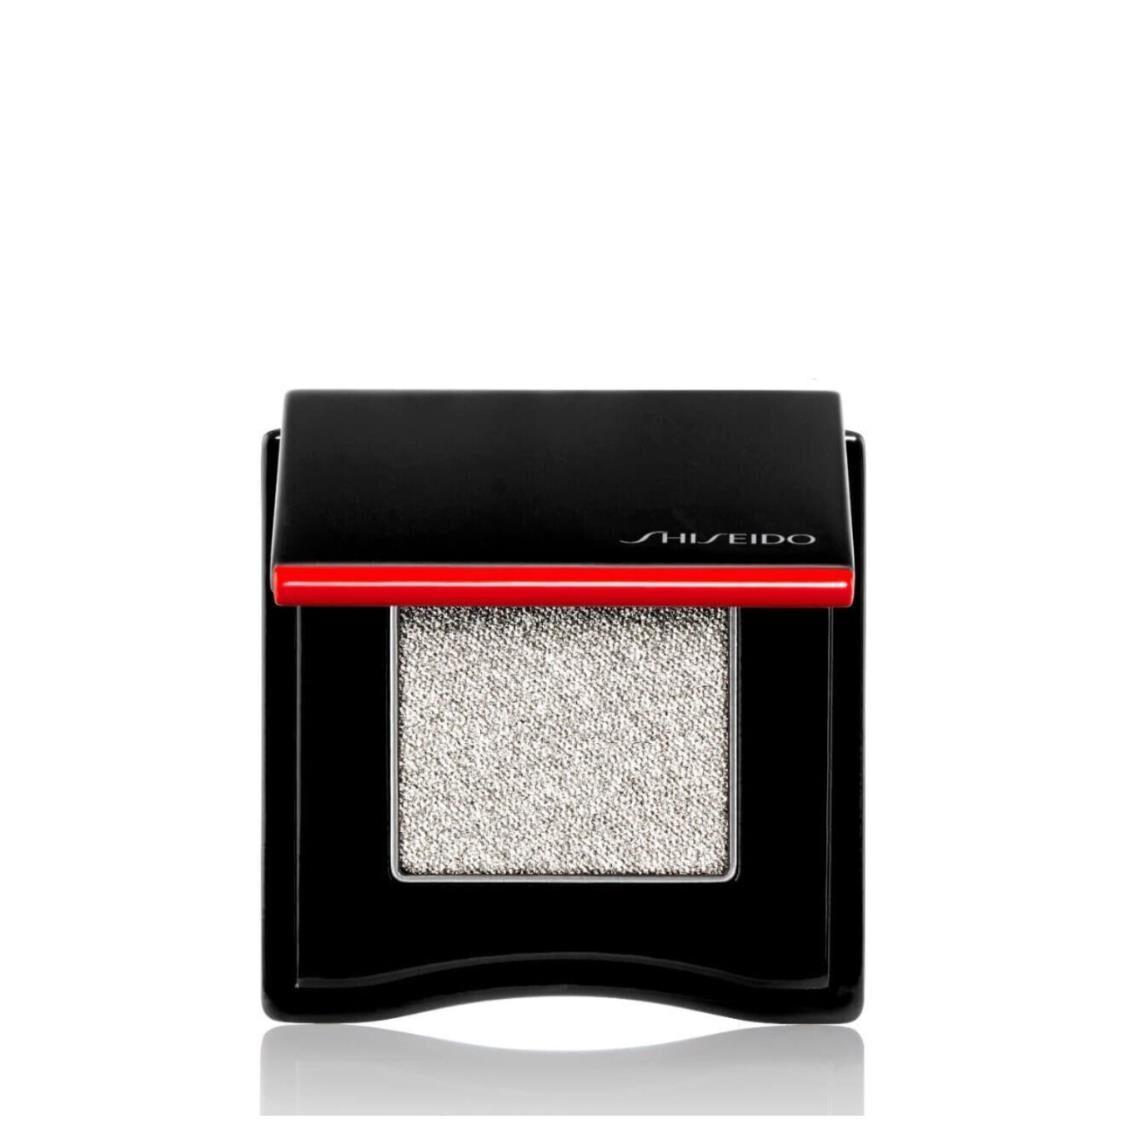 Shiseido POP PowderGel Eye Shadow 07 Shari-Shari Silver